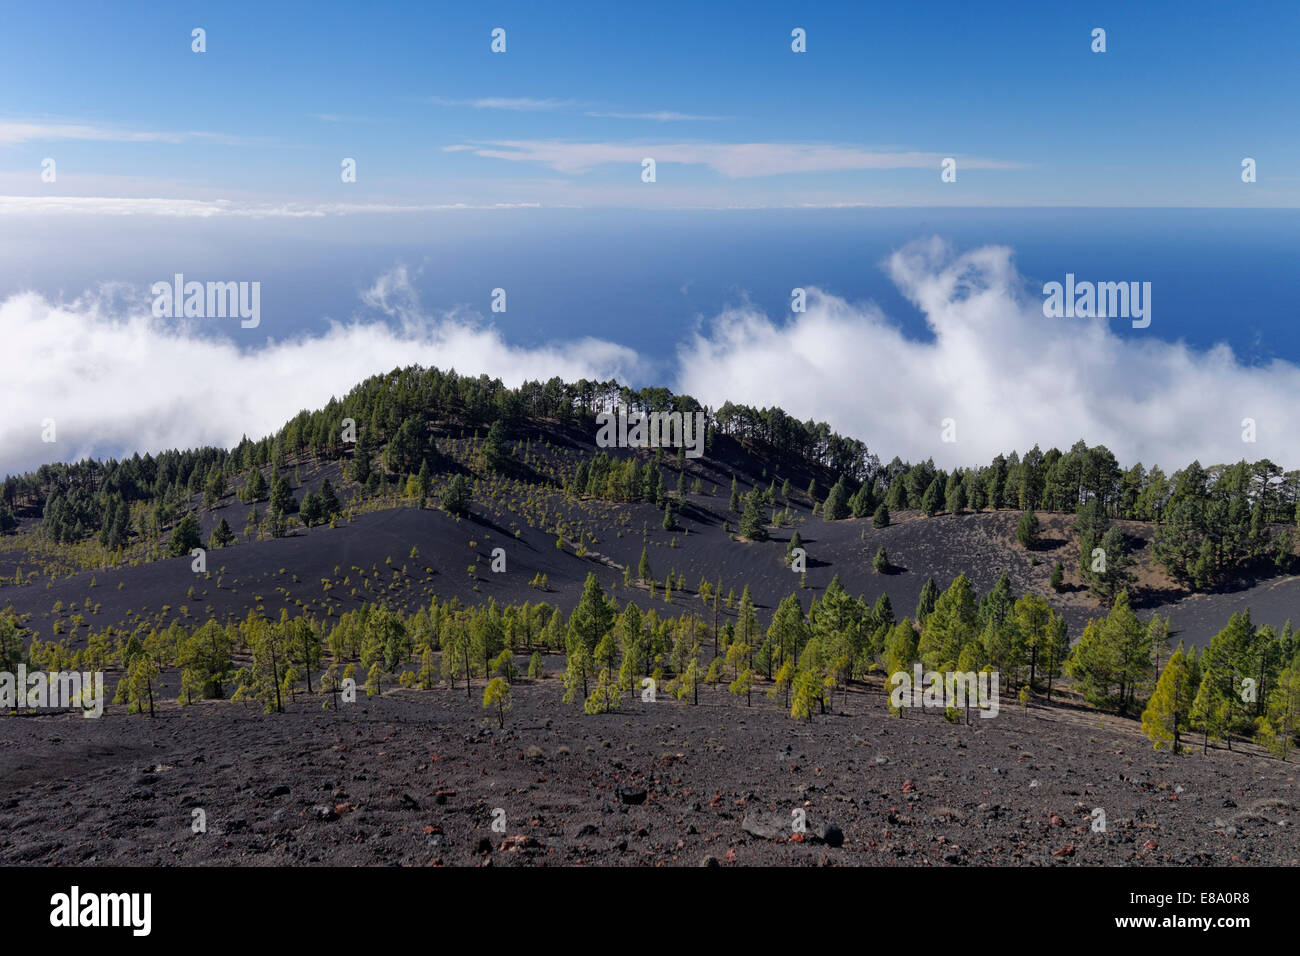 View from the Volcano San Martín, Cumbre Vieja in Fuencaliente, La Palma, Canary Islands, Spain - Stock Image